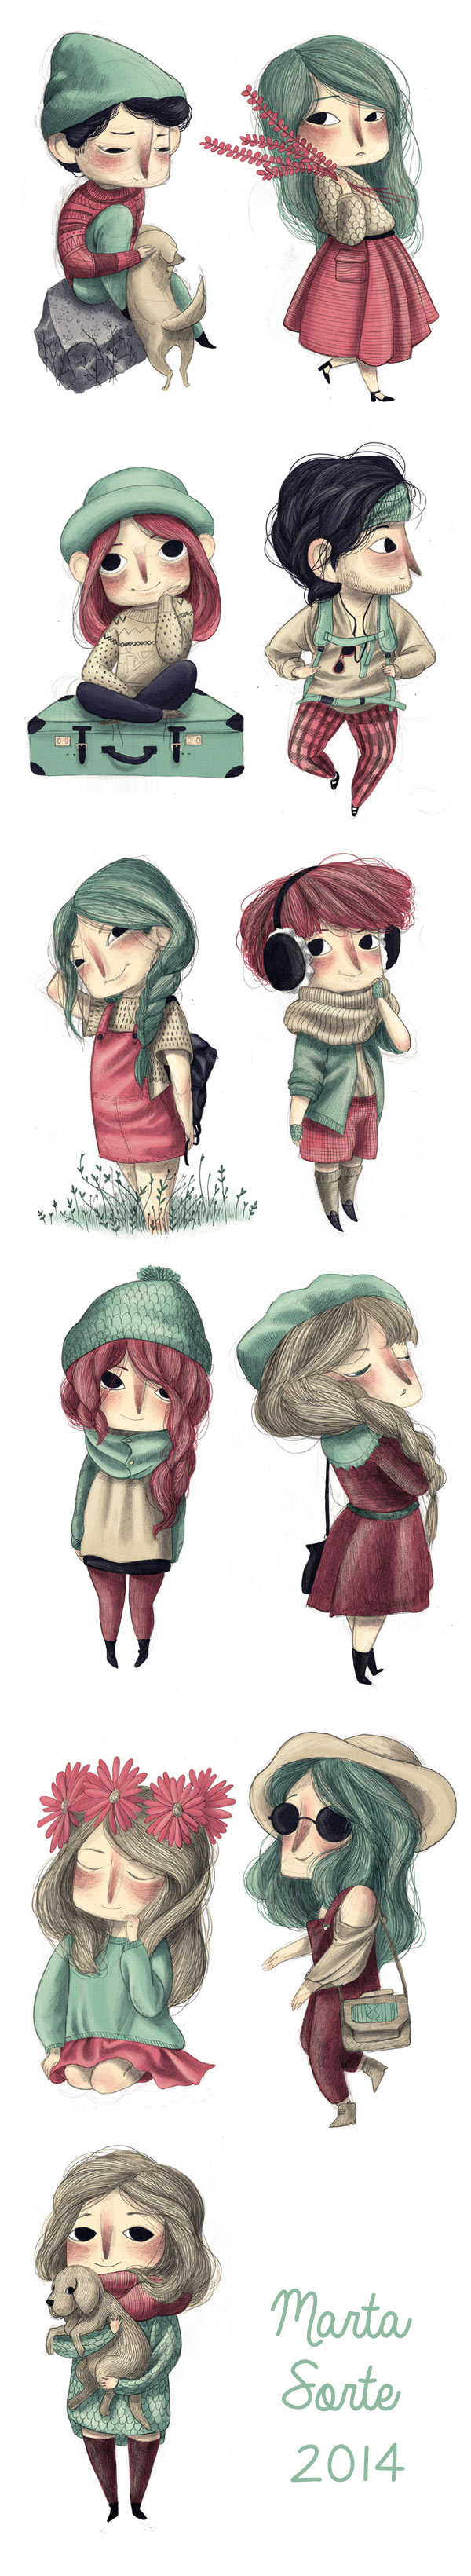 Marta Sorte - Daily Character ilustraciones